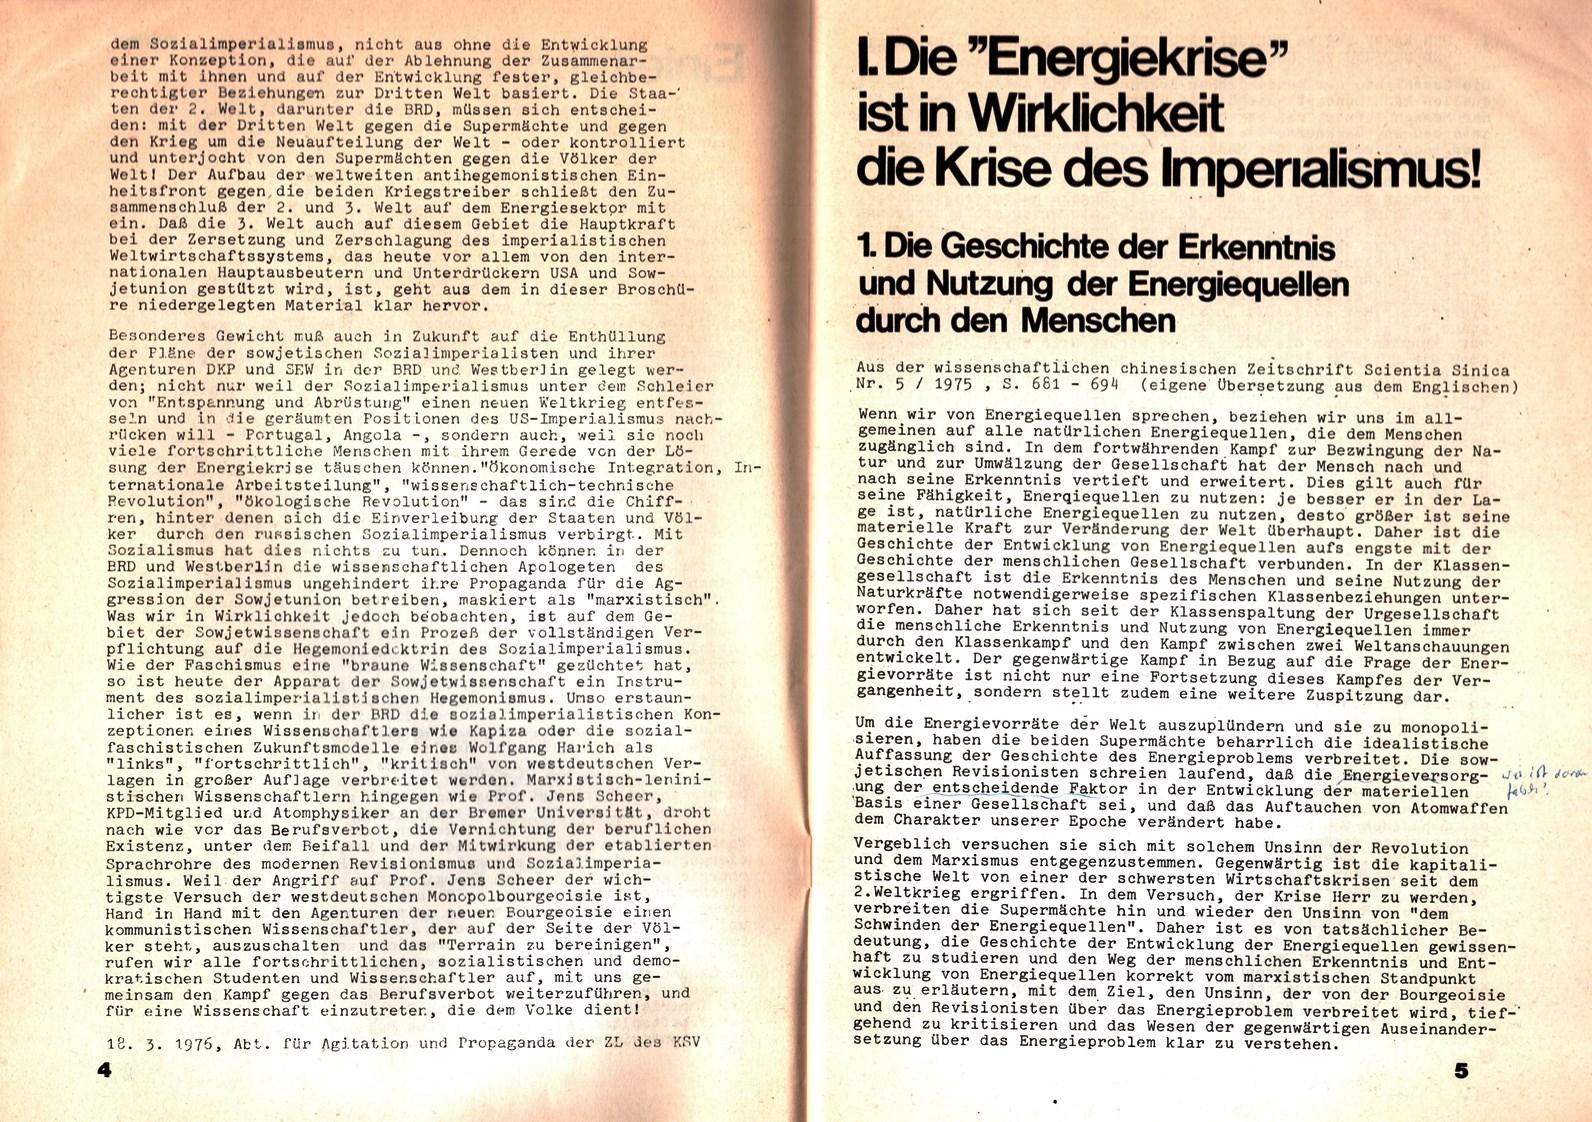 KSV_1976_Atomenergie_im_Kapitalismus_004